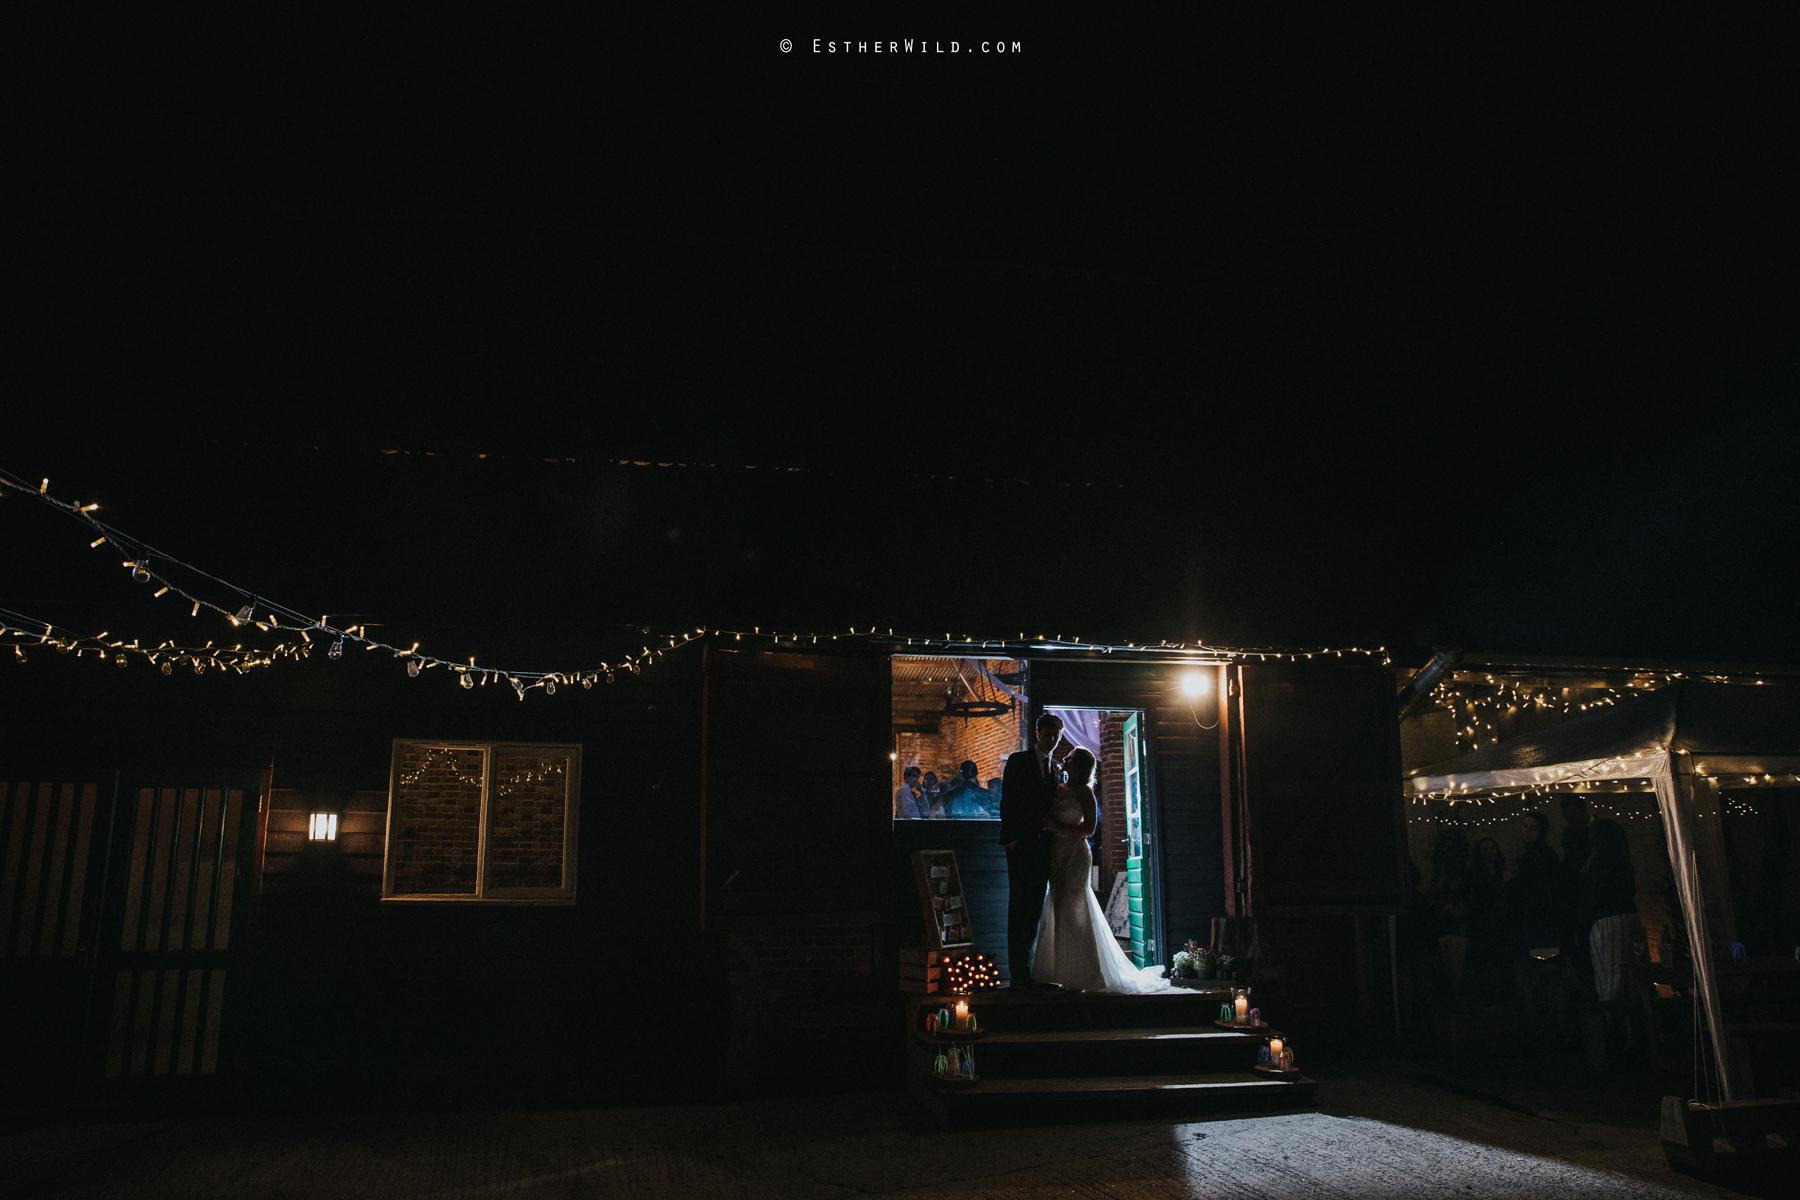 Glebe_Farm_Barn_Rustic_Norfolk_Wedding_Esther_Wild_Photographer_Copyright_IMG_3170.jpg